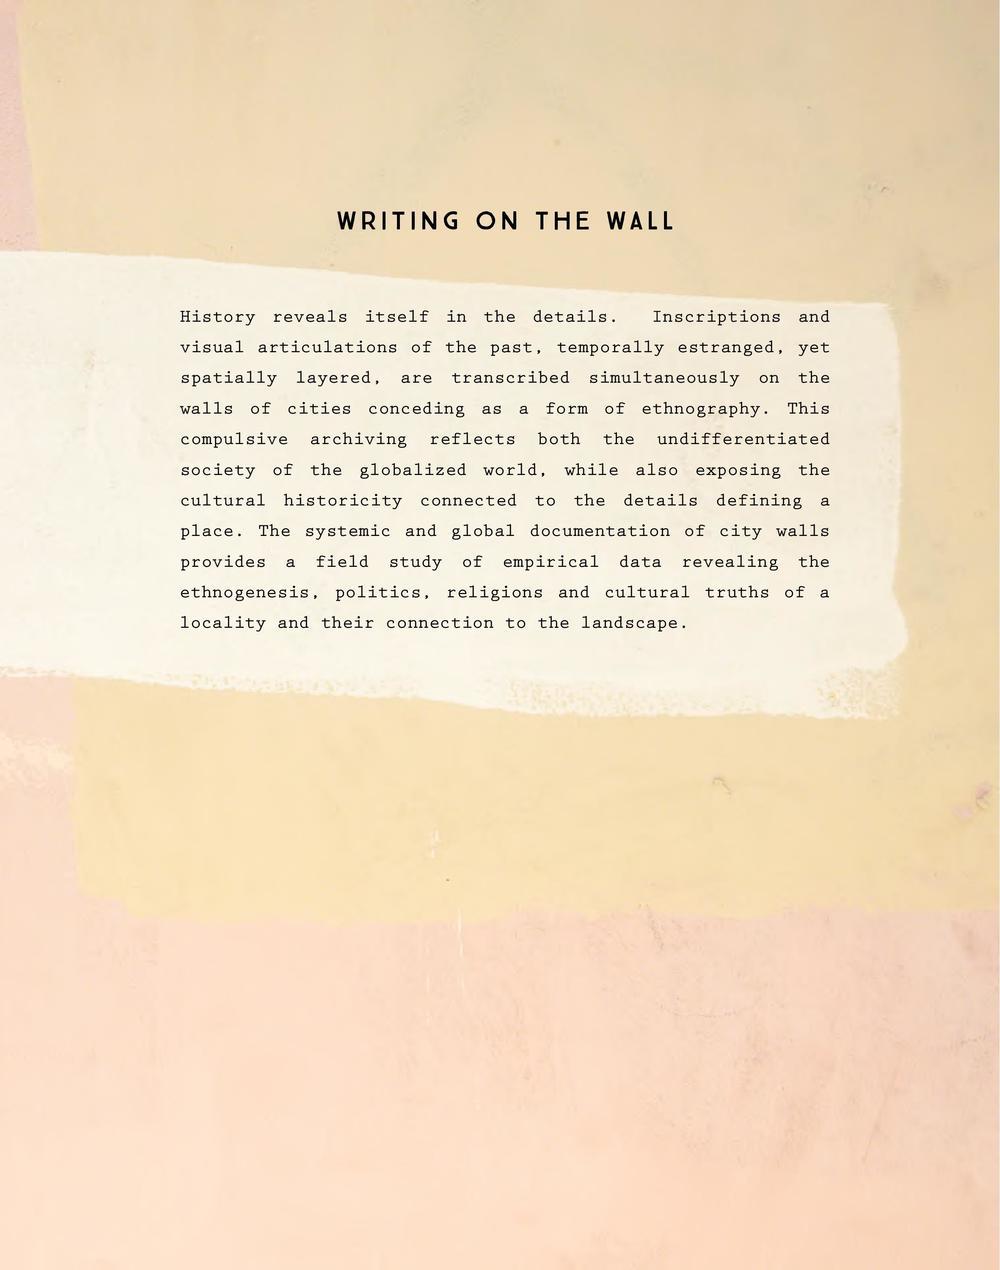 WritingOnWall-Catalog-HEYDT-email-page-007.jpg